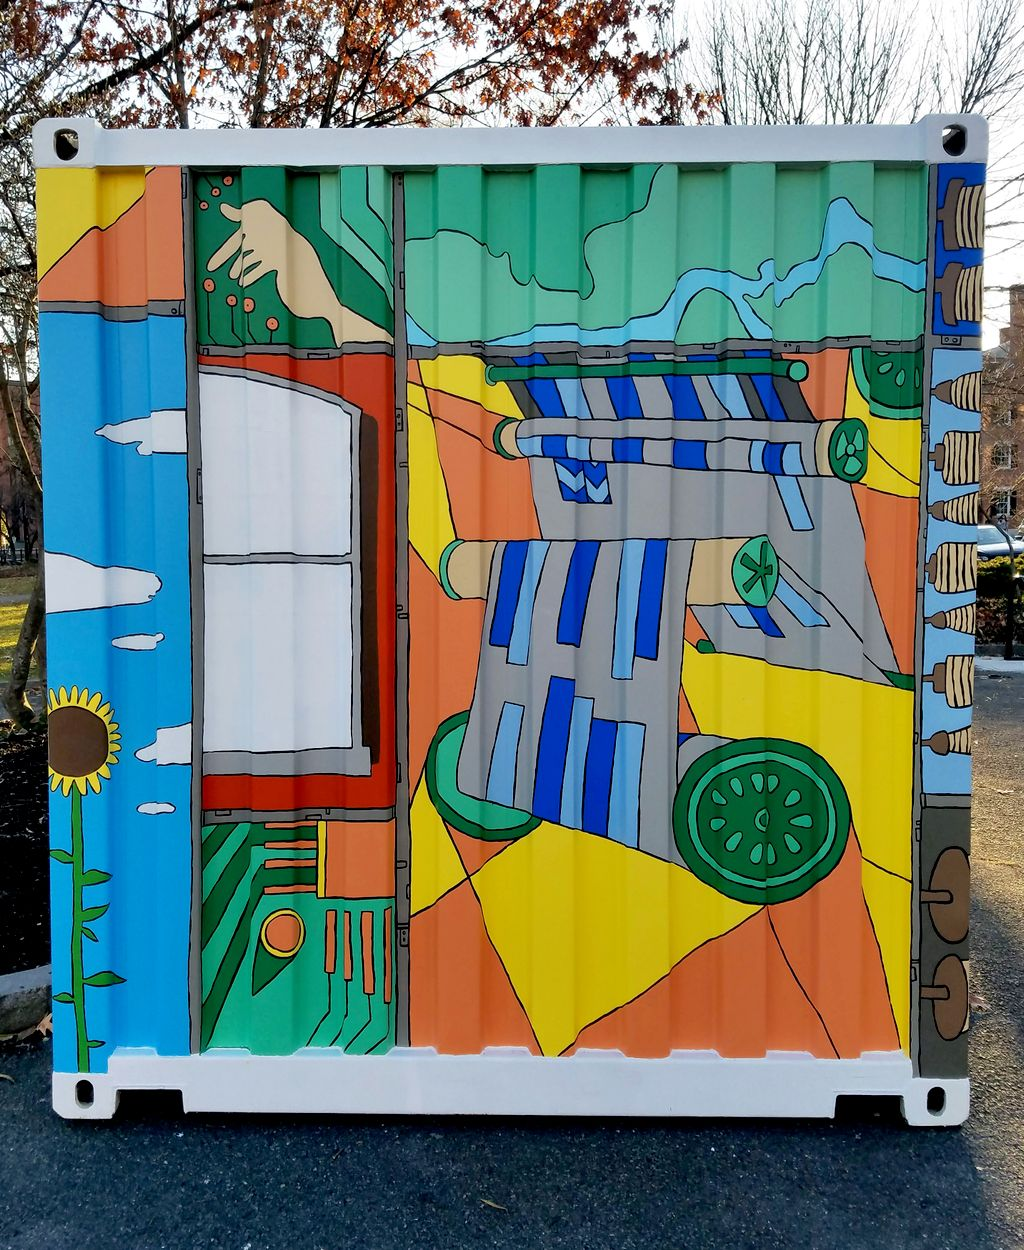 Kerouac Park Container Mural